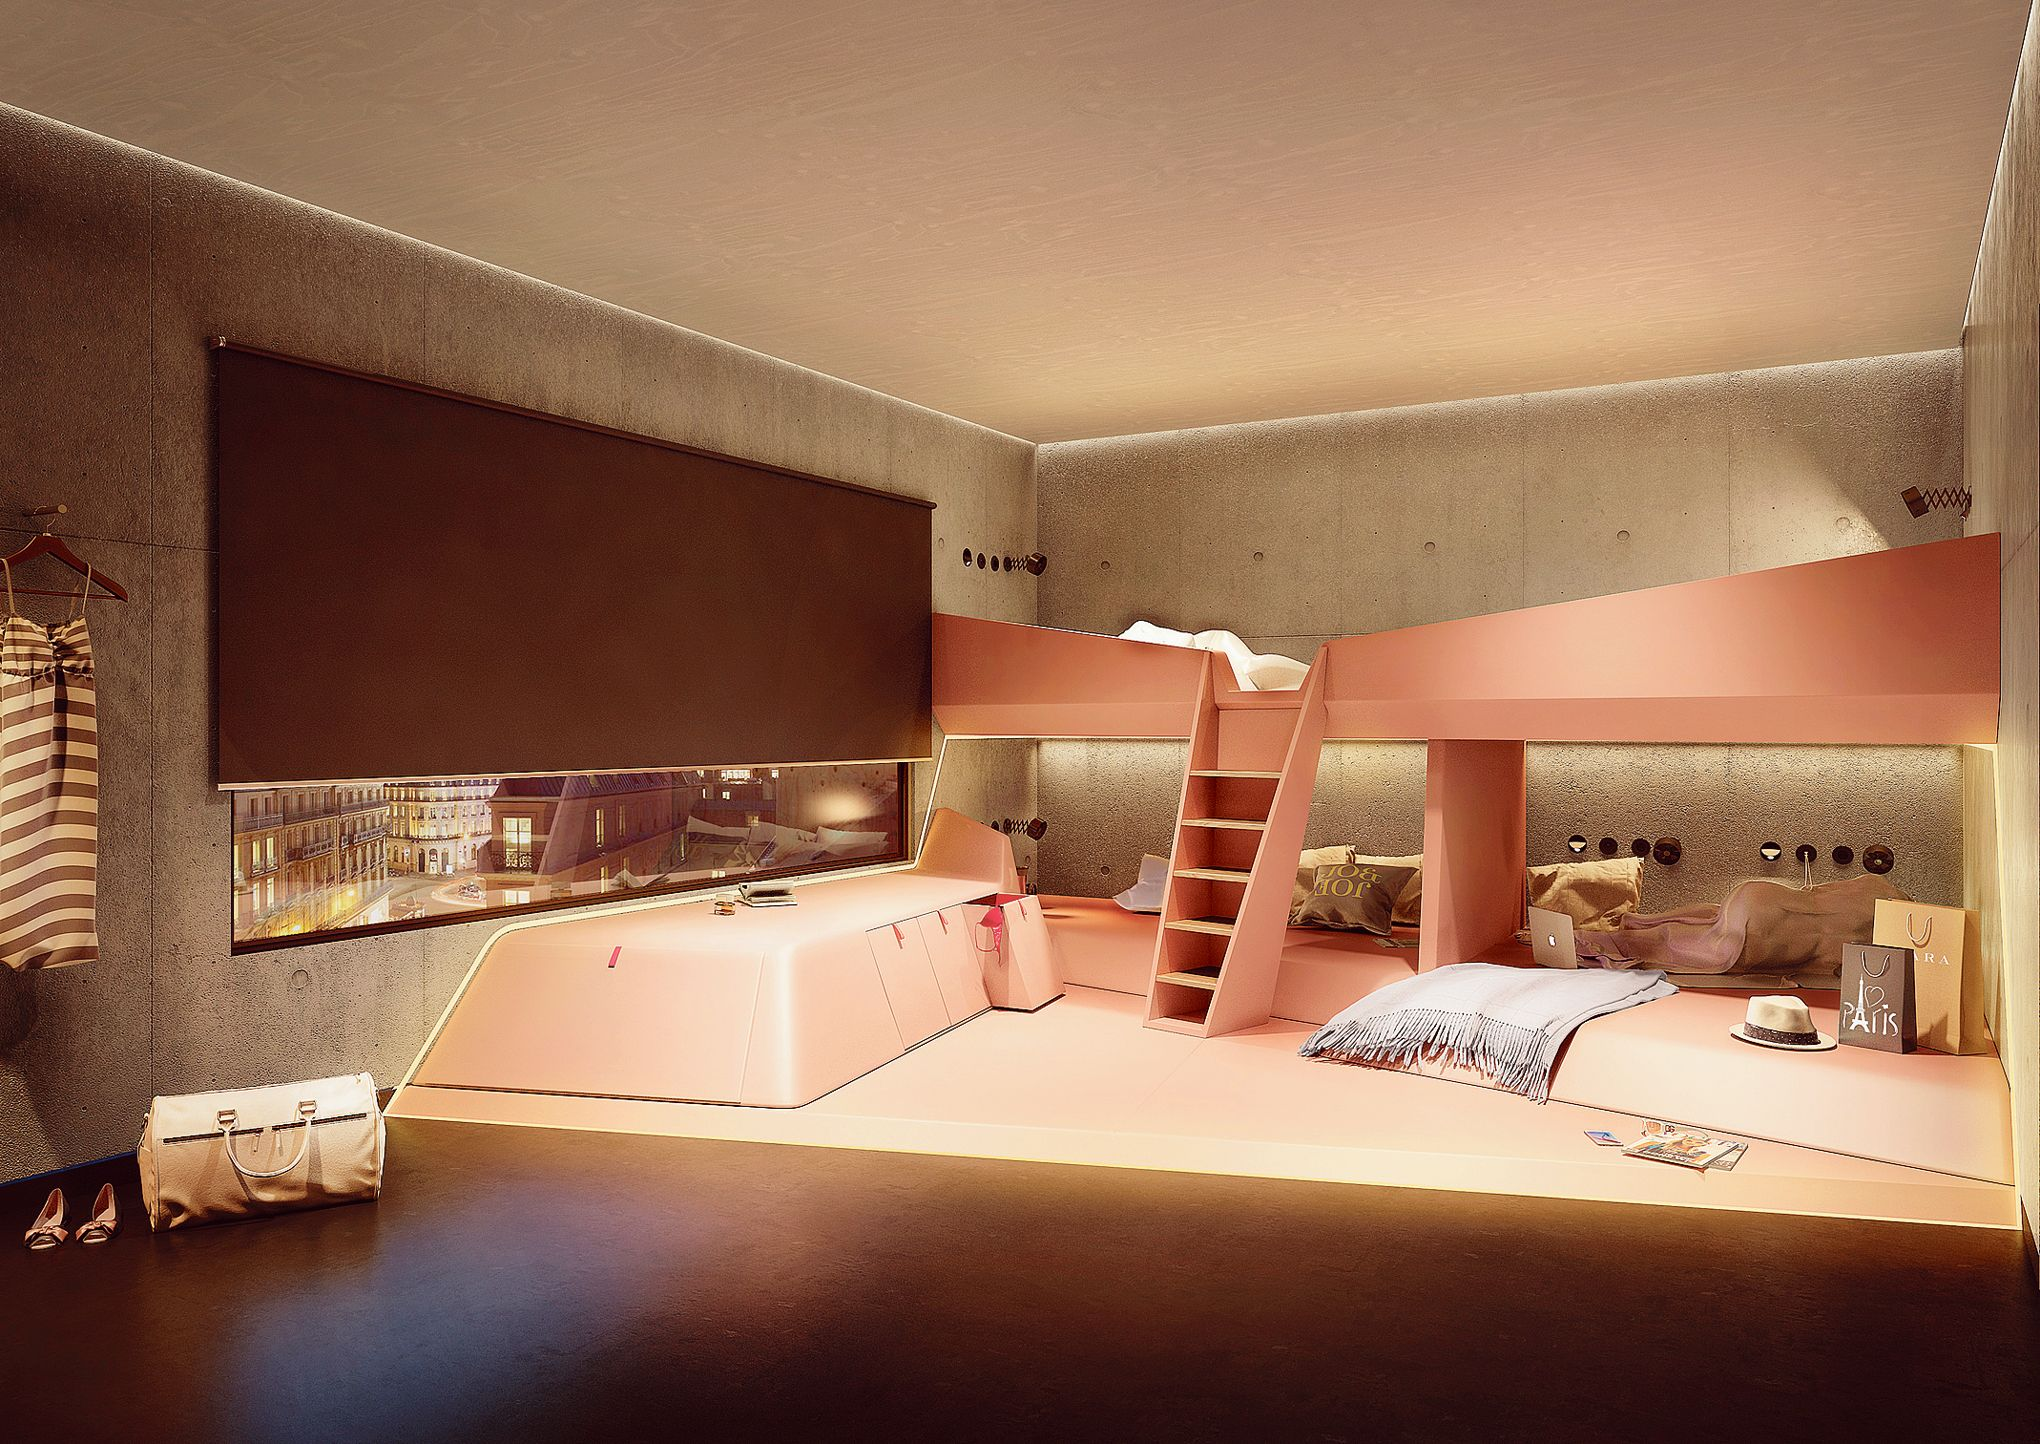 accor veut r inventer l 39 auberge de jeunesse avec jo joe. Black Bedroom Furniture Sets. Home Design Ideas